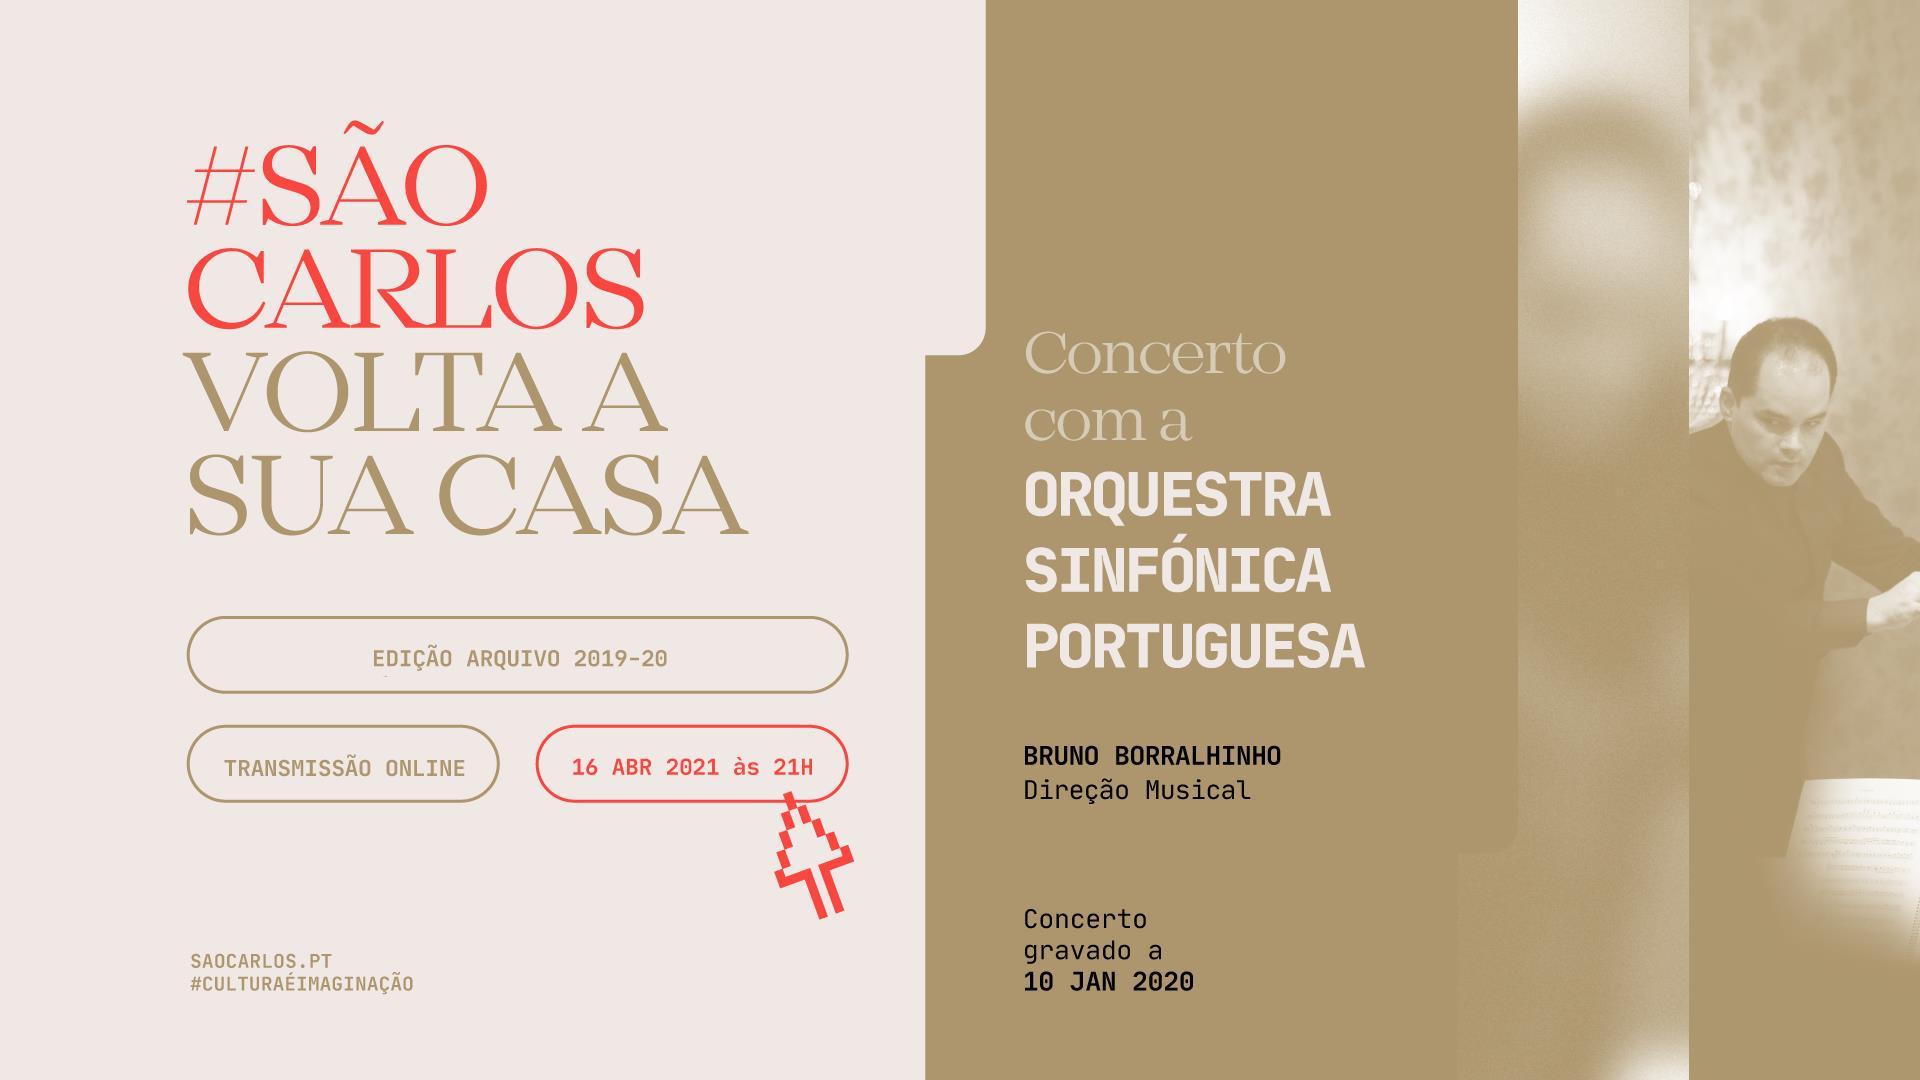 Sala online do Teatro Nacional de São Carlos — Concerto Orquestra Sinfónica Portuguesa